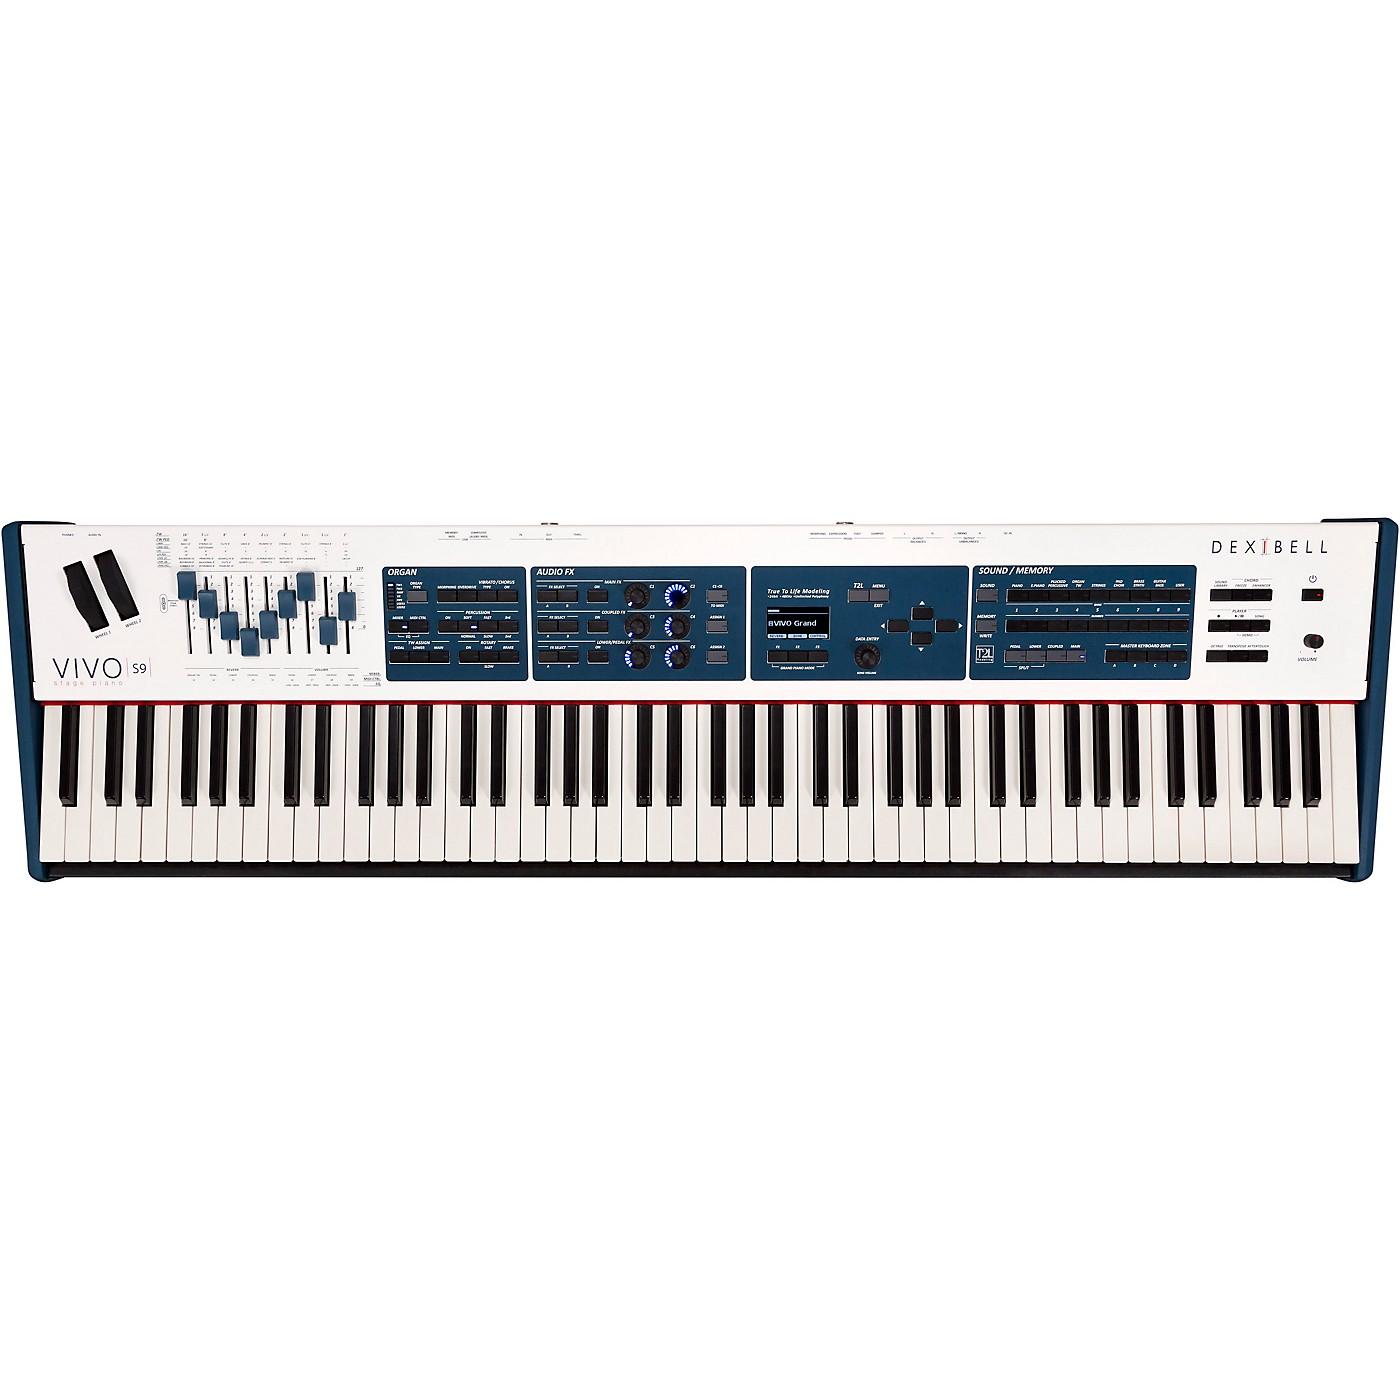 Dexibell VIVO S9 88-Key Stage Piano thumbnail